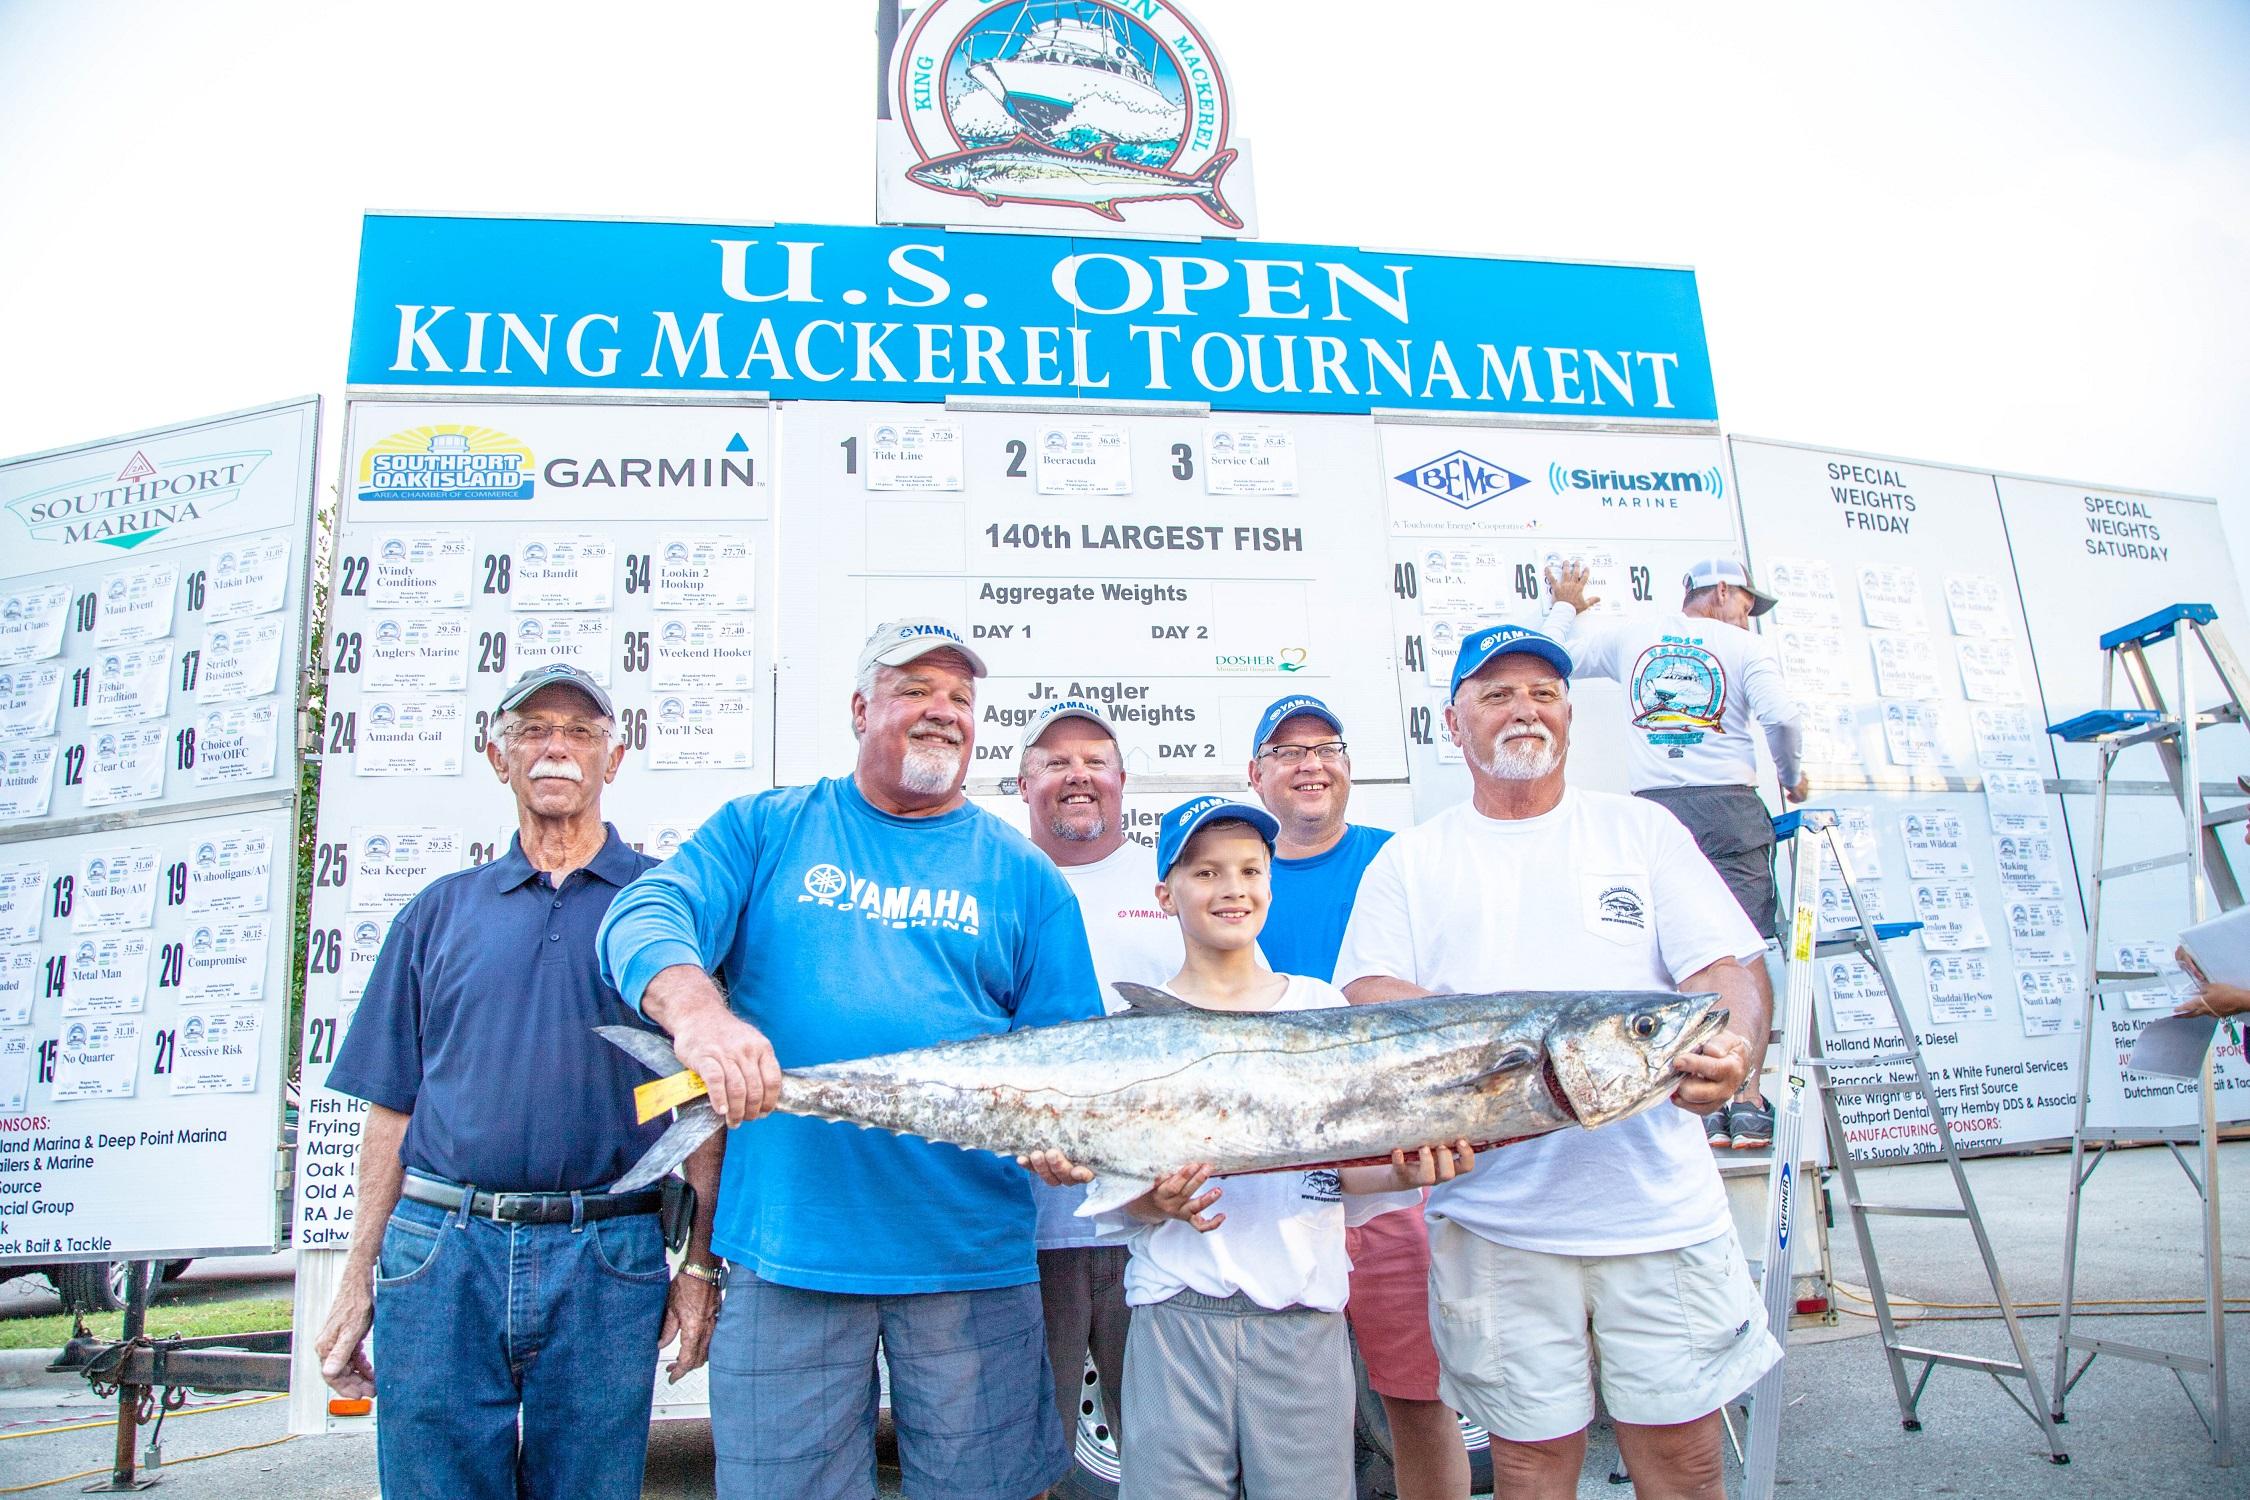 US Open King Mackerel Tournament Winner 2018